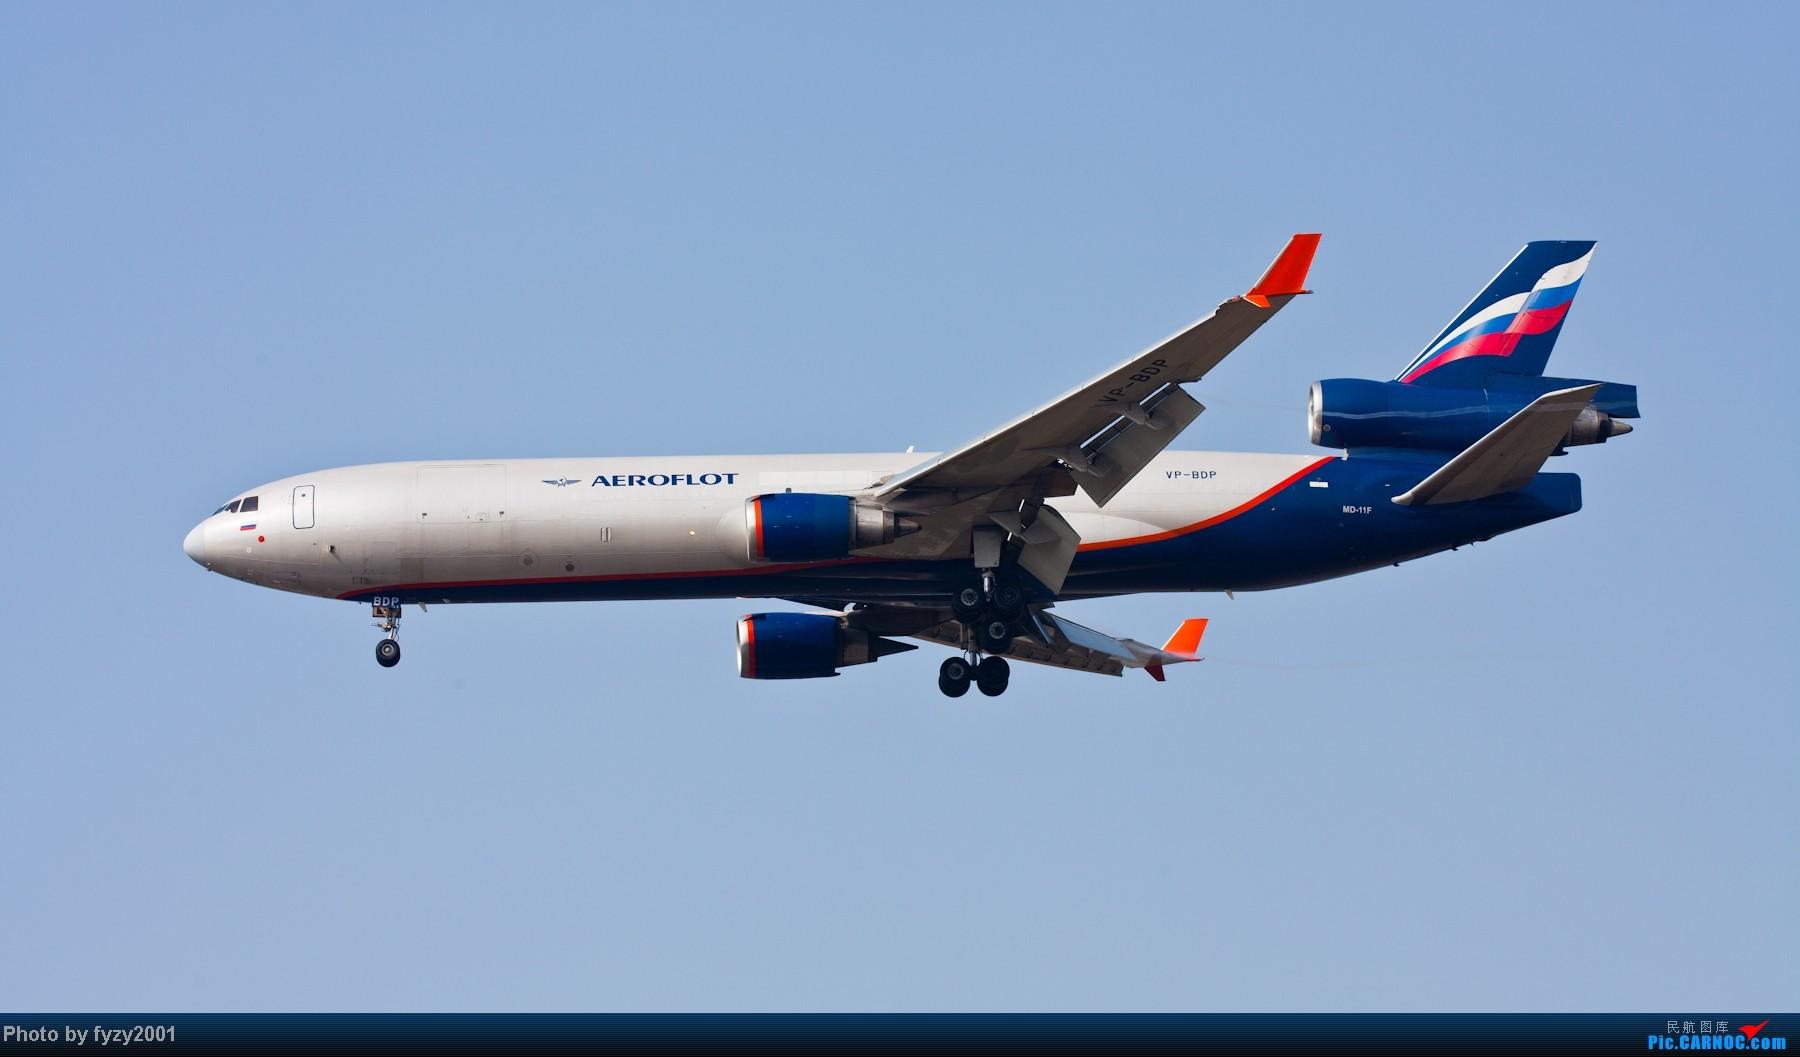 Re:[原创][无锡西站]RP爆表的拍摄-1800超大图 MCDONNELL DOUGLAS MD-11 VP-BDP 中国上海浦东机场